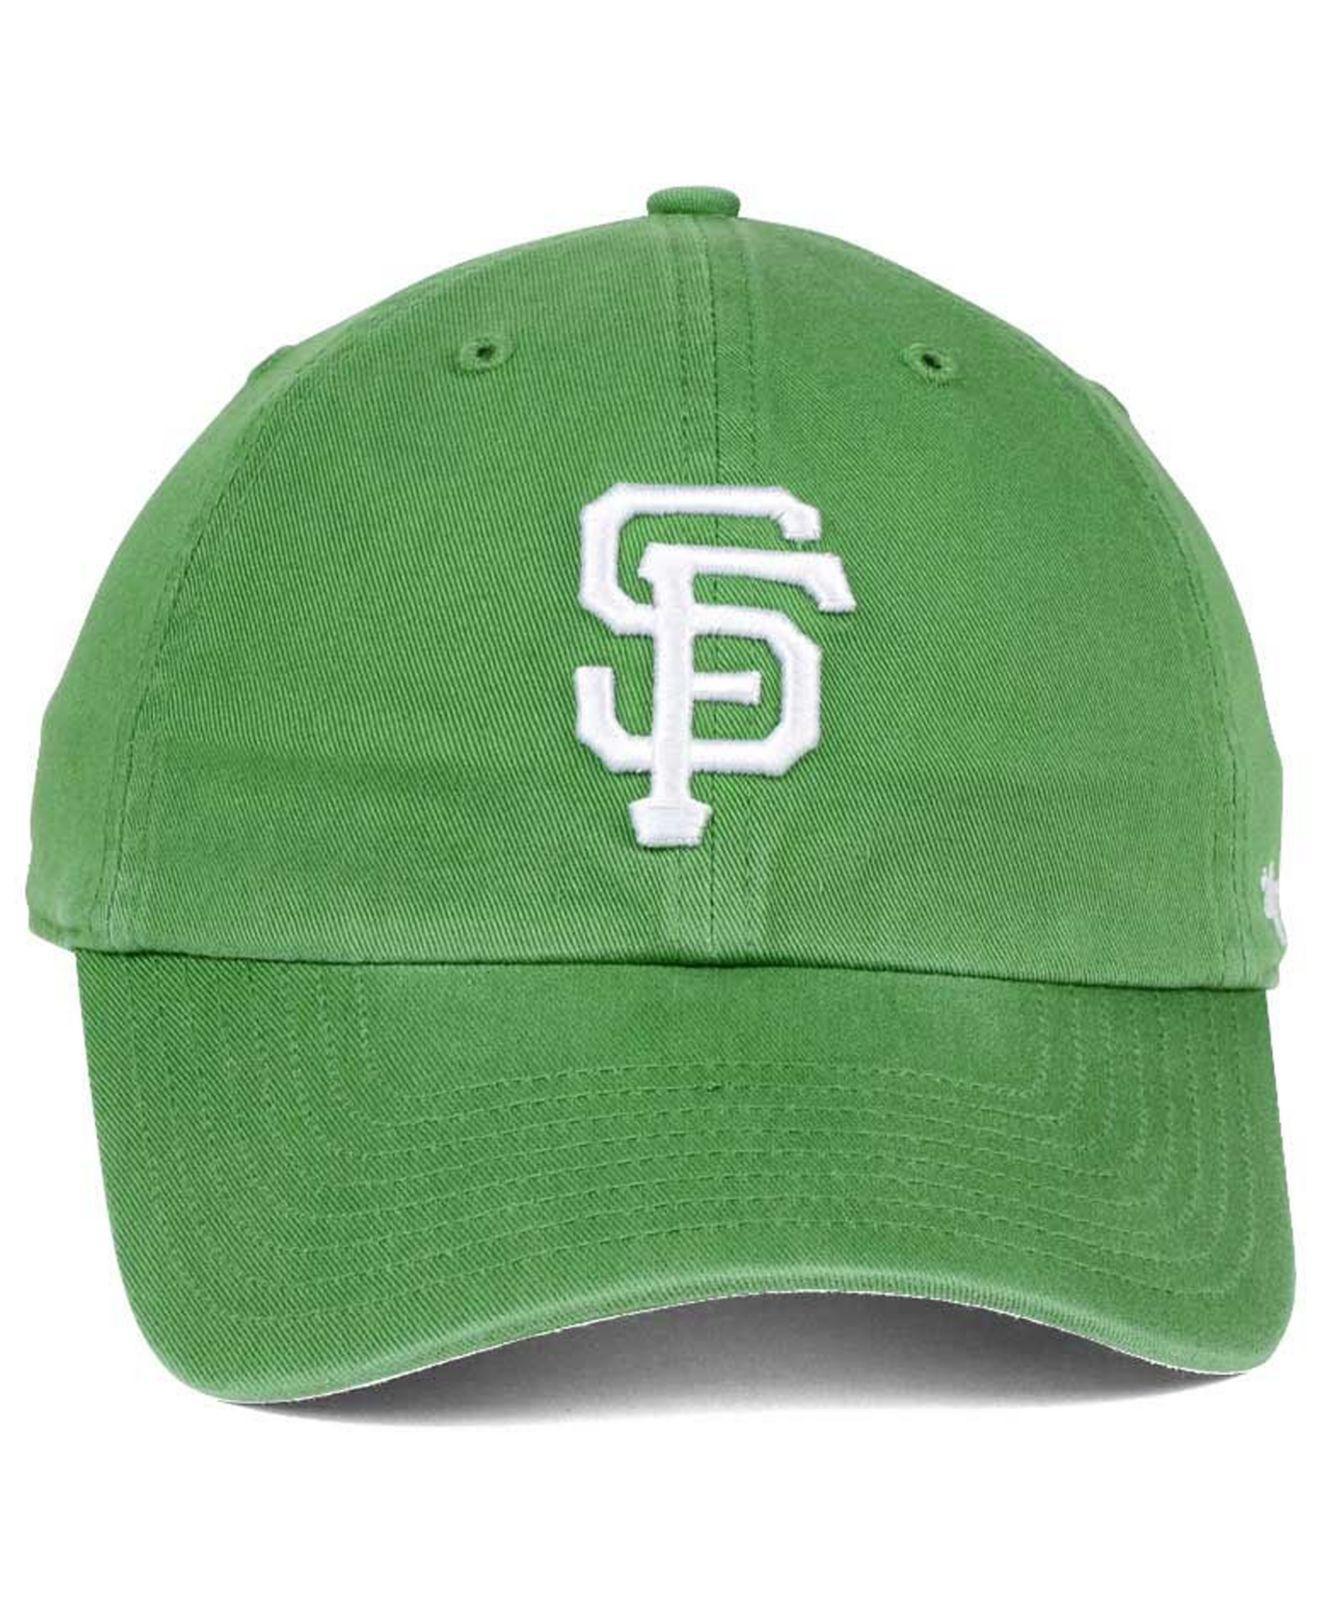 new arrivals 71bbd 8e057 47 Brand - San Francisco Giants Fatigue Green Clean Up Cap for Men - Lyst.  View fullscreen